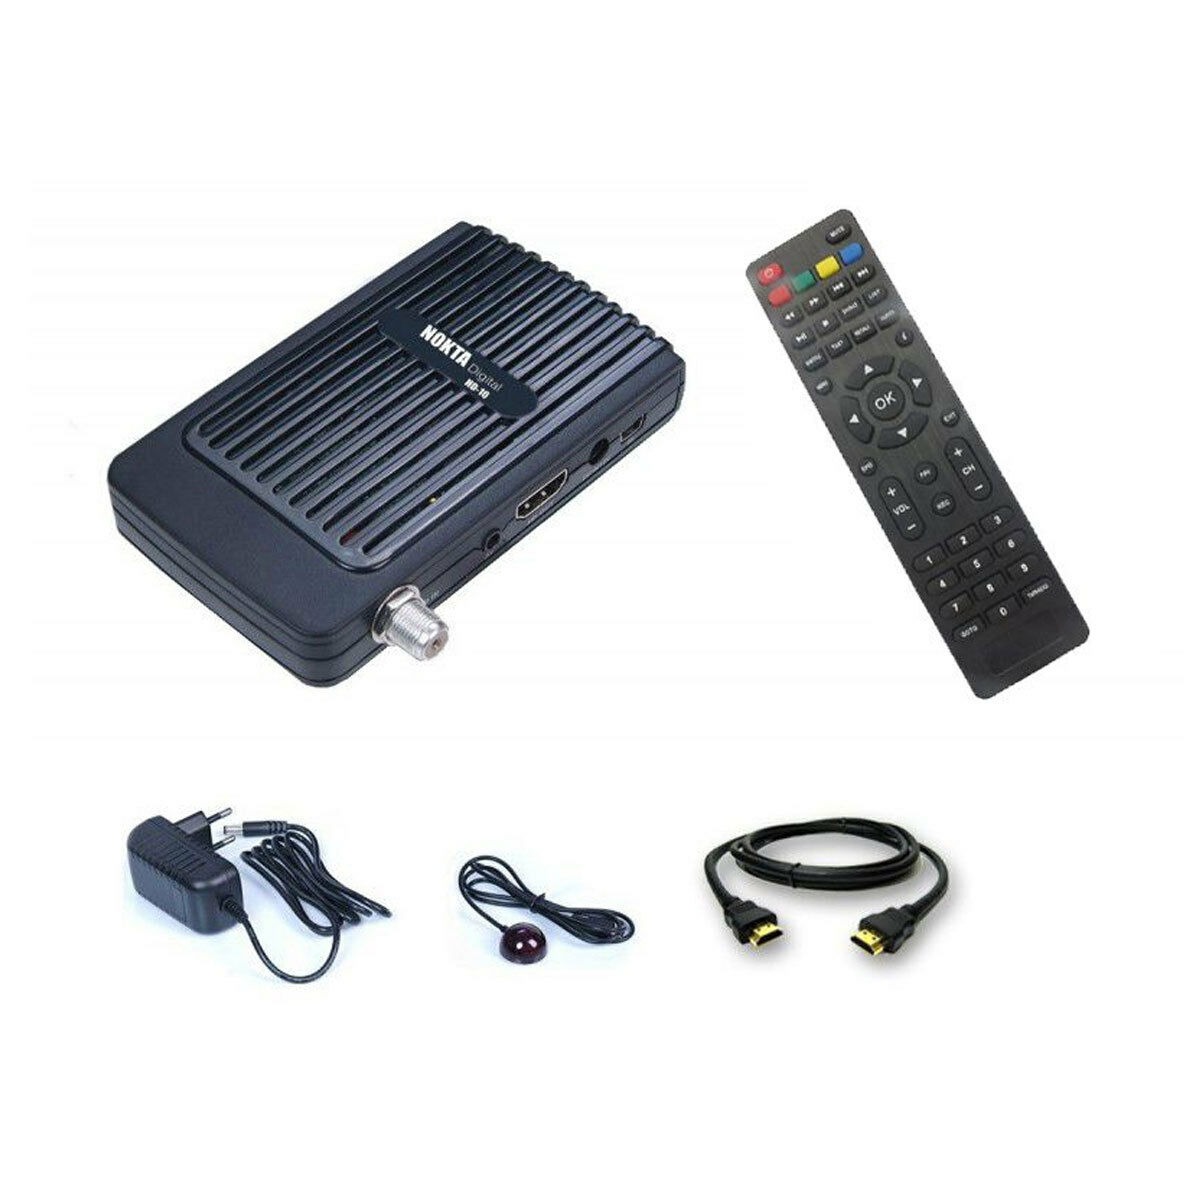 Mini HDTV Camping Satelliten Receiver HD 12 V SAT DVB-S2 mit 2x USB + IR Sensor